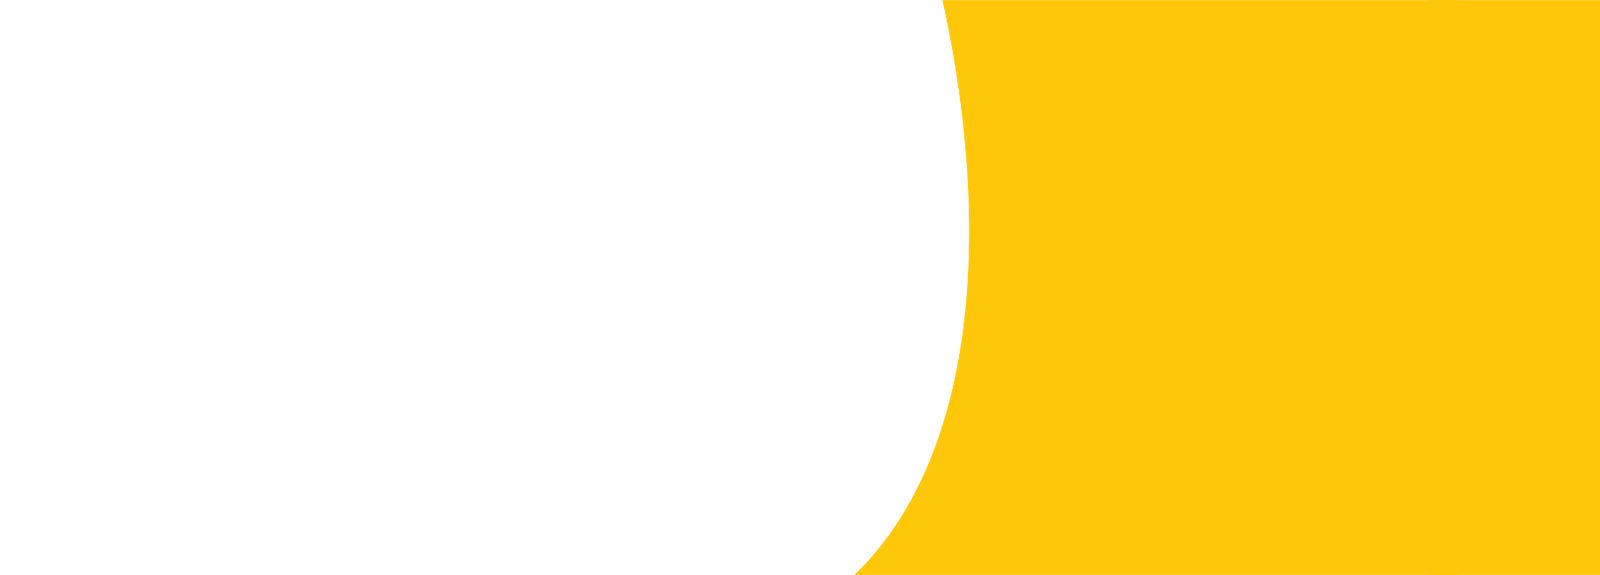 Banner Pattern Desktop